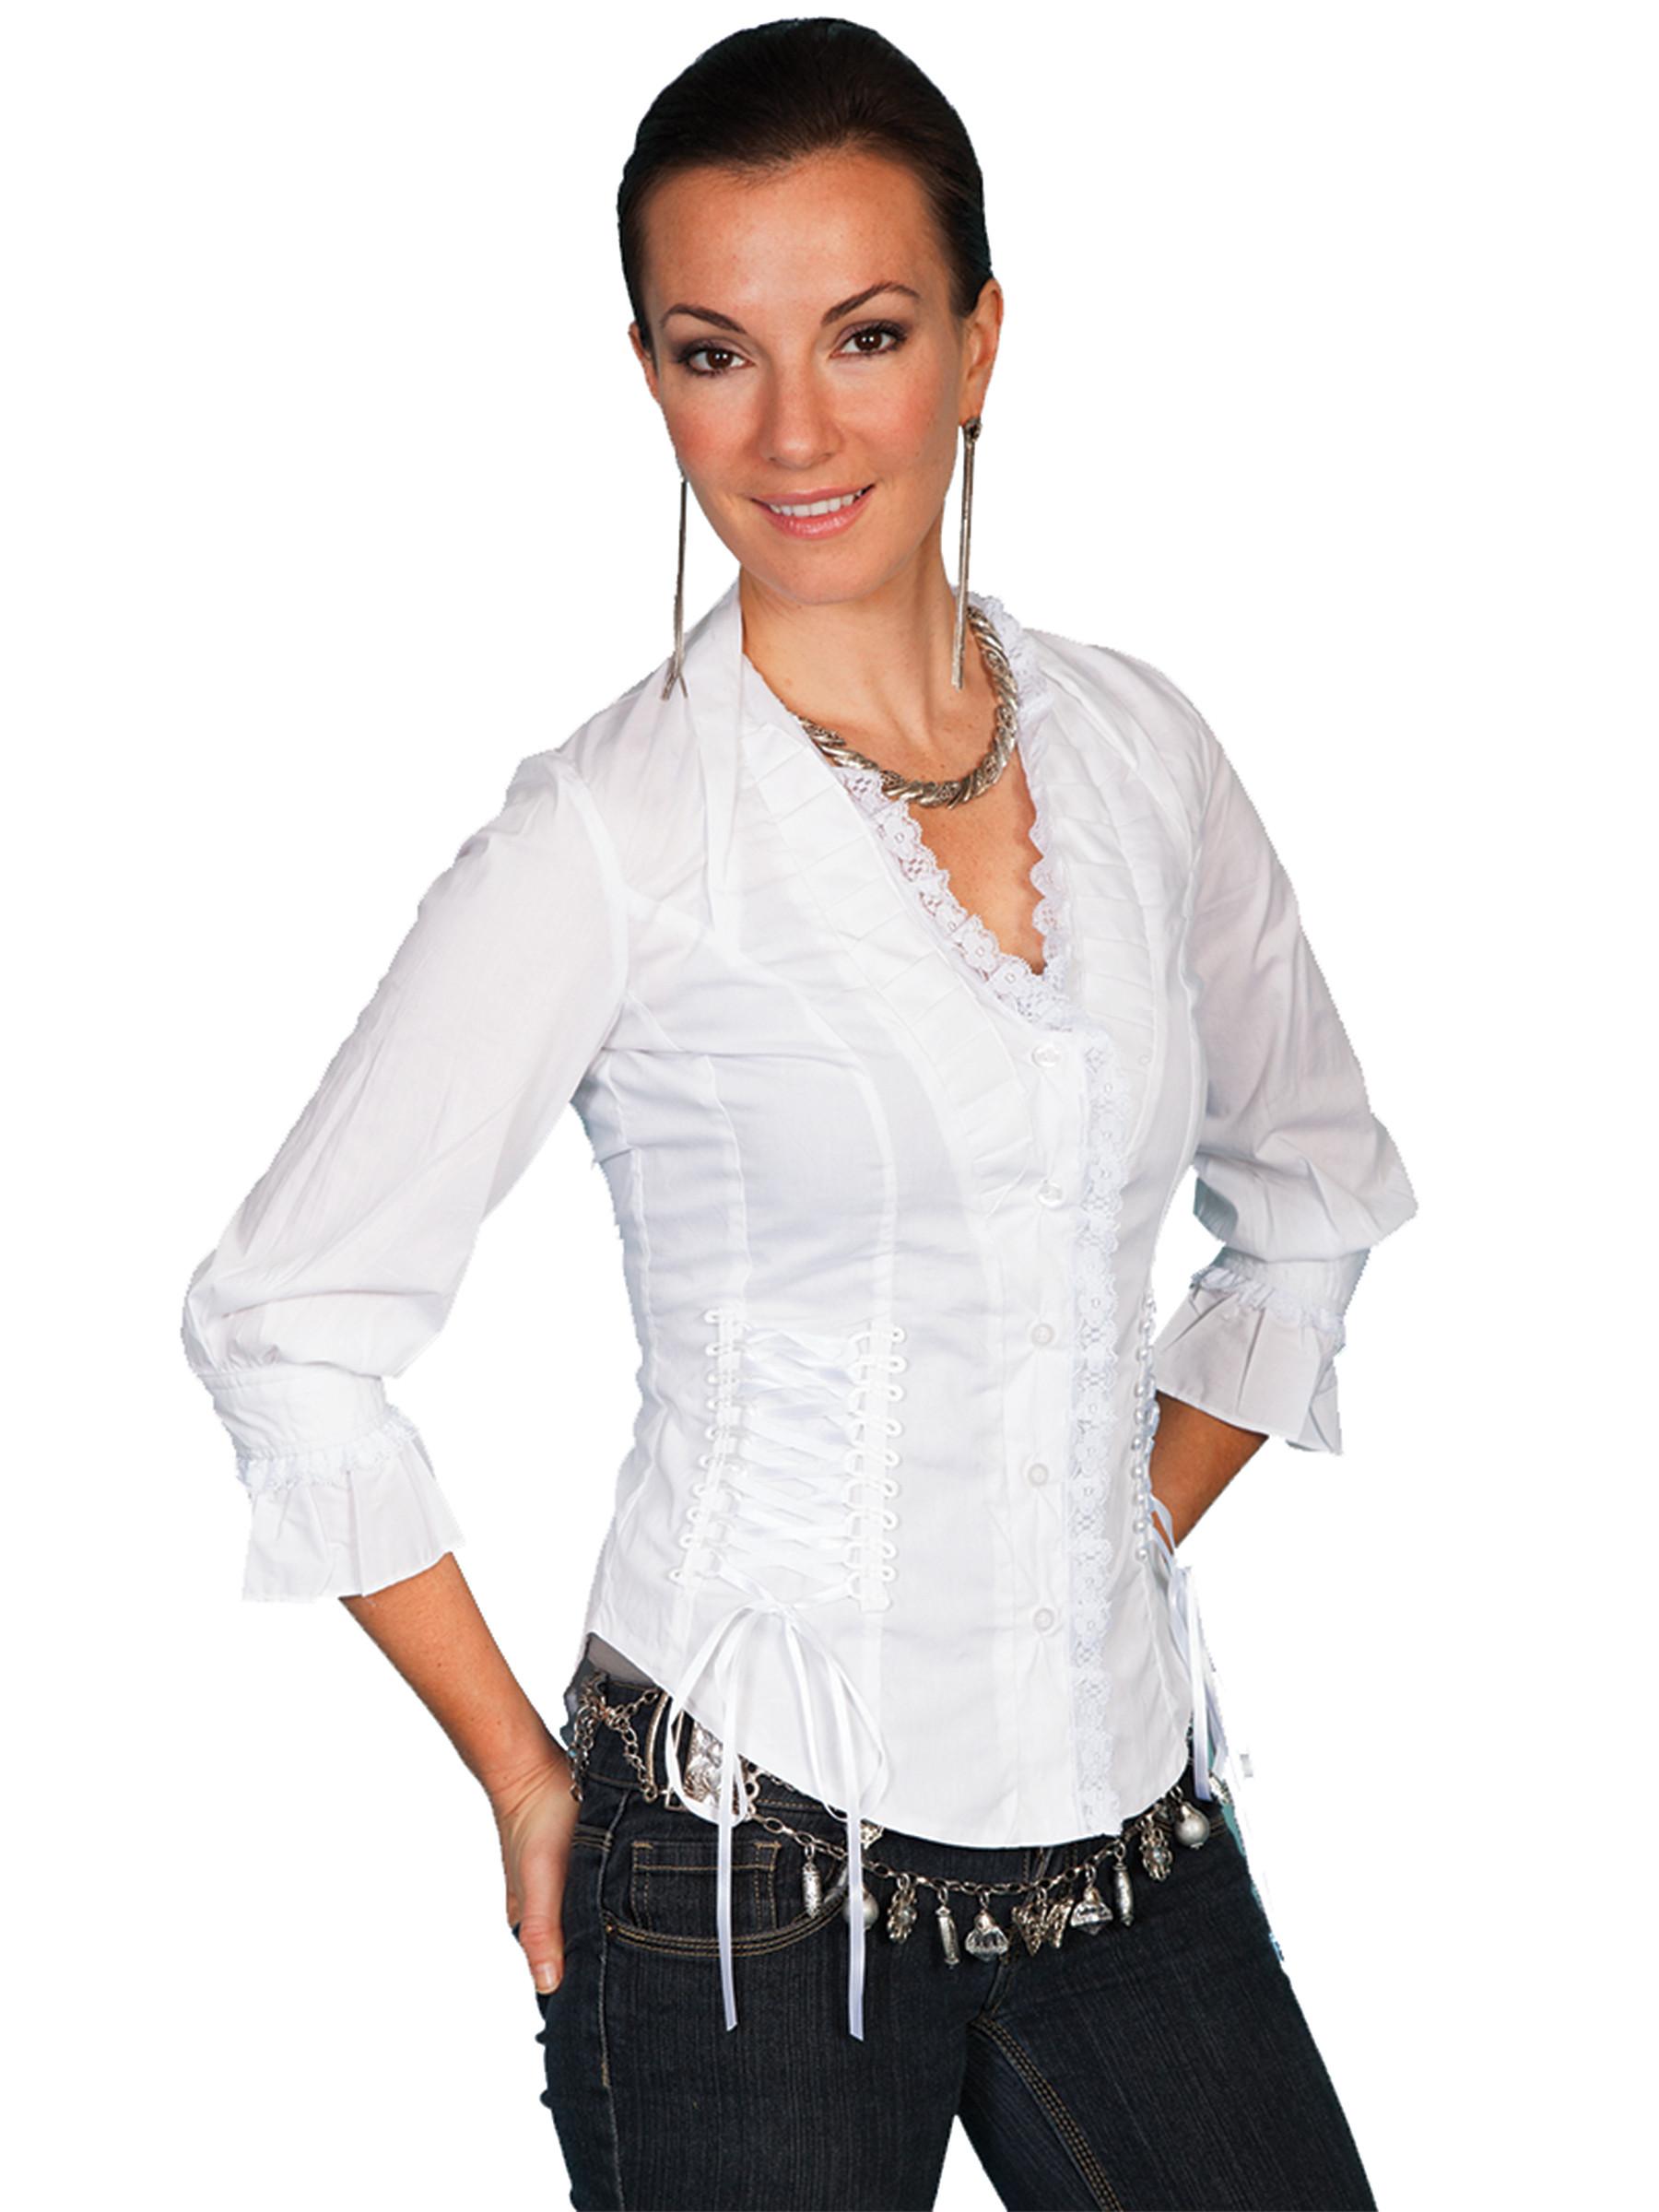 Znalezione obrazy dla zapytania corset on shirt